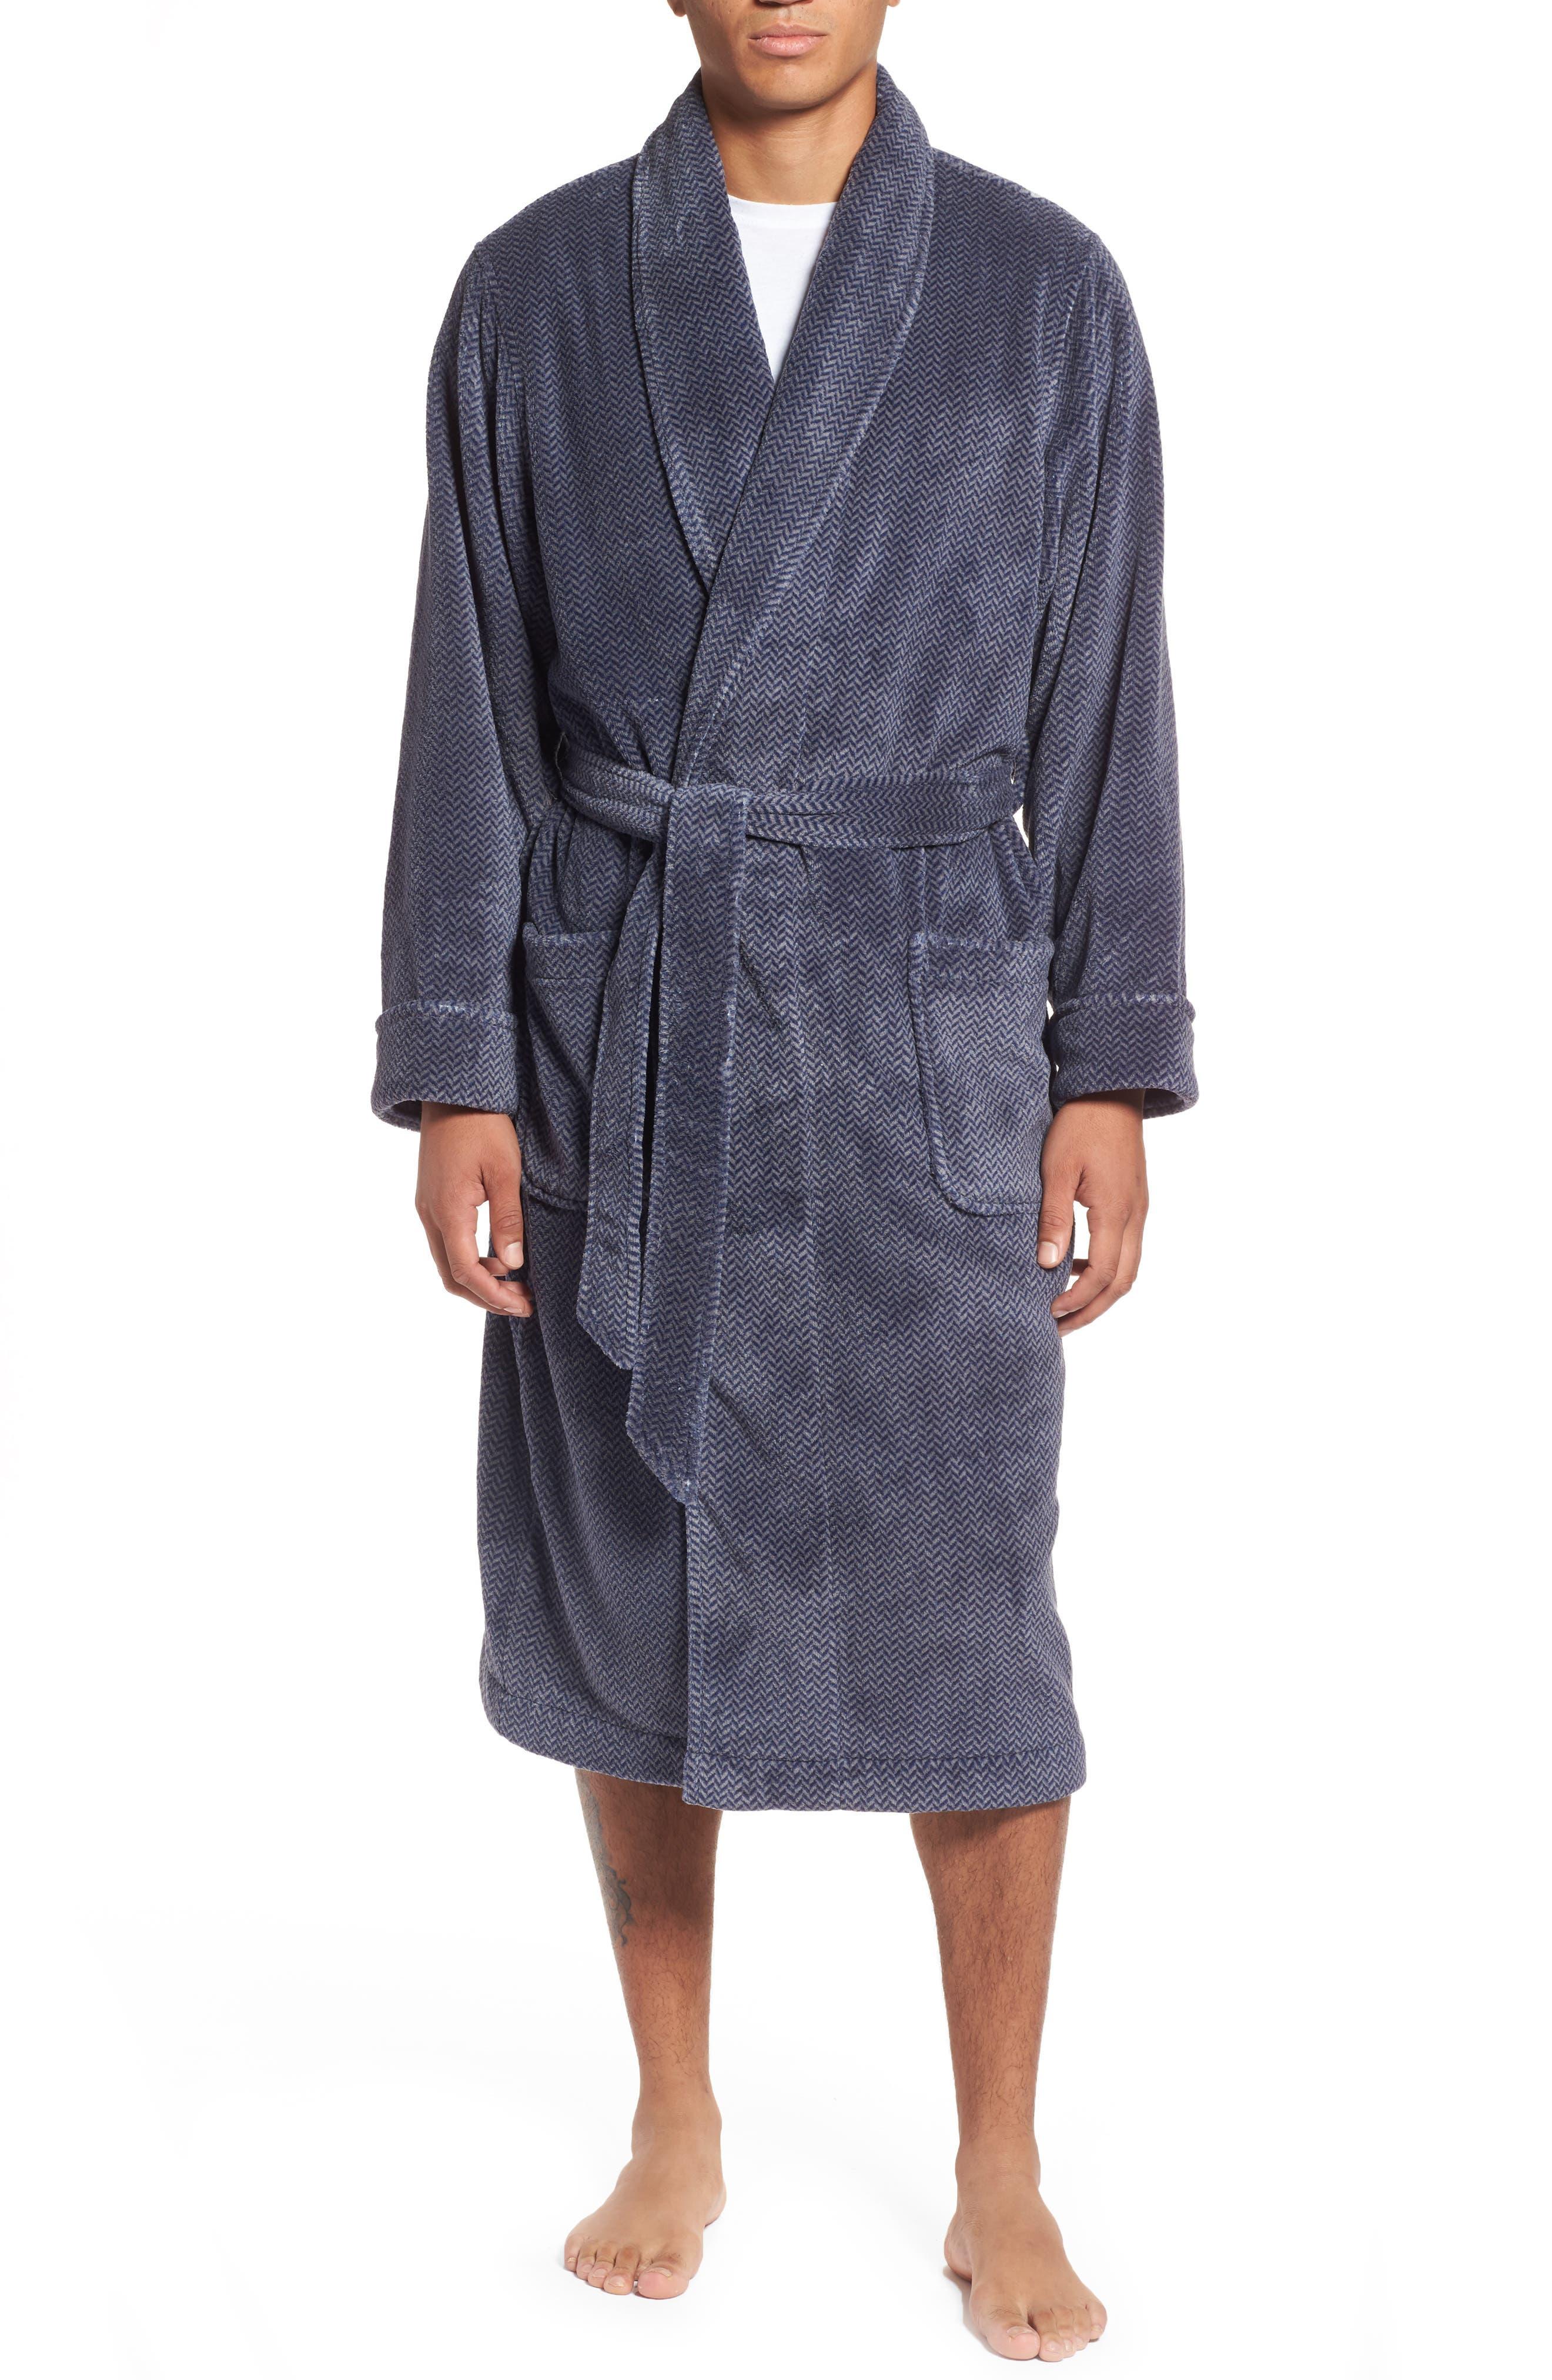 Herringbone Fleece Robe,                             Main thumbnail 1, color,                             Navy Indigo- Grey Herringbone